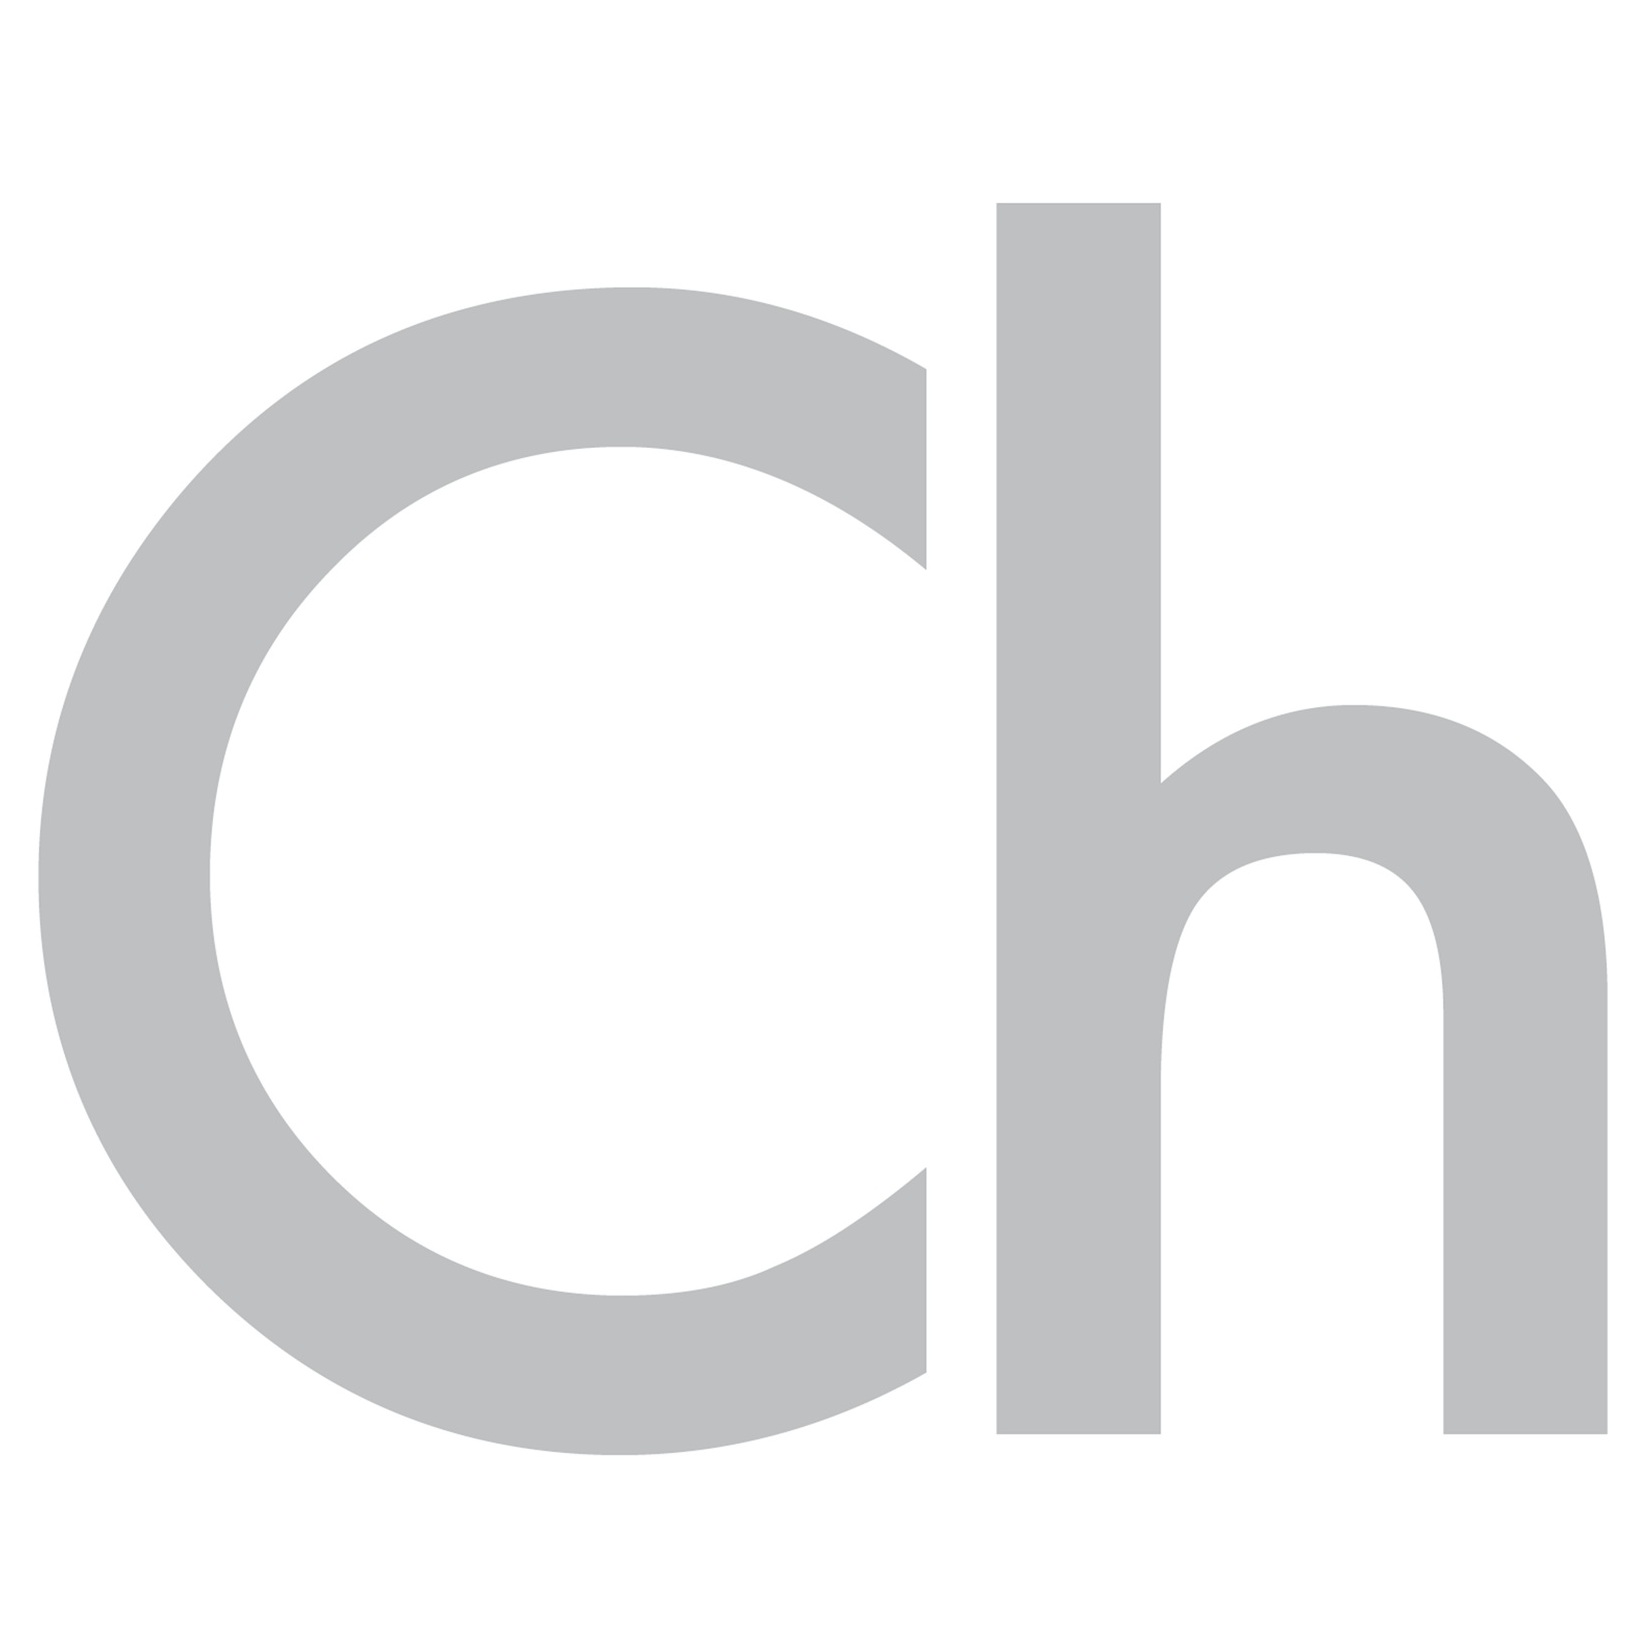 LOGO_CH_300_website.jpg